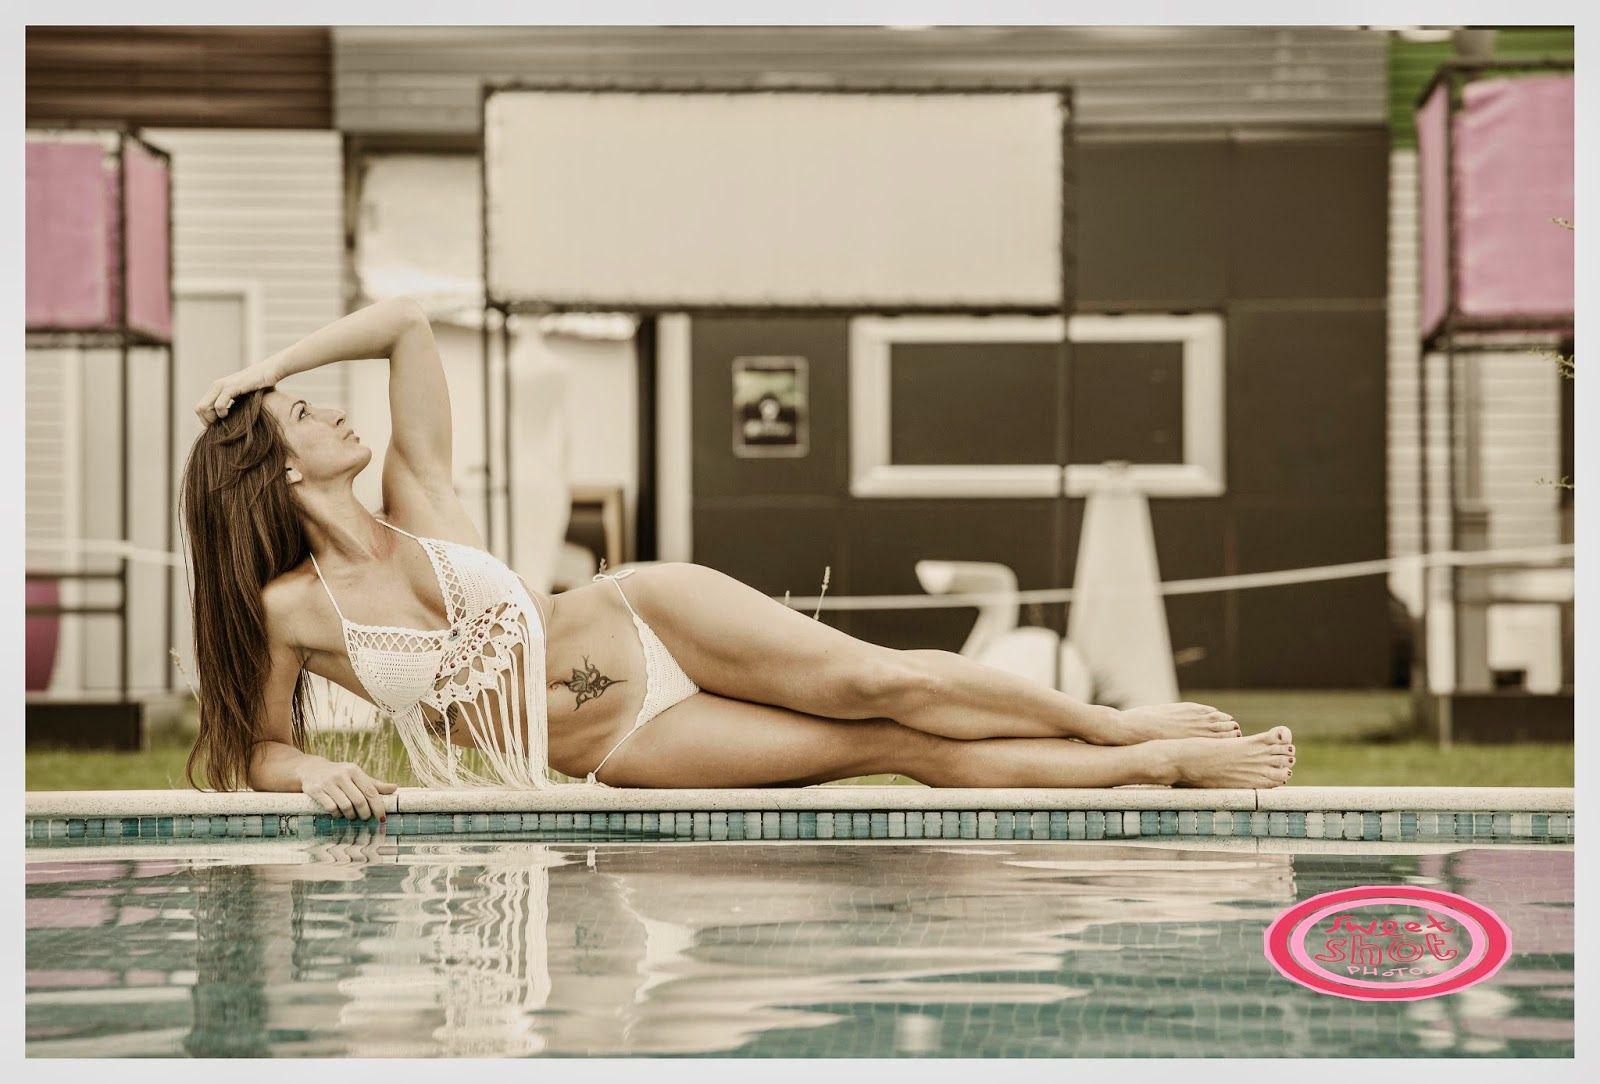 vistecheap: TanTú: bikinis y tops hechos a mano.